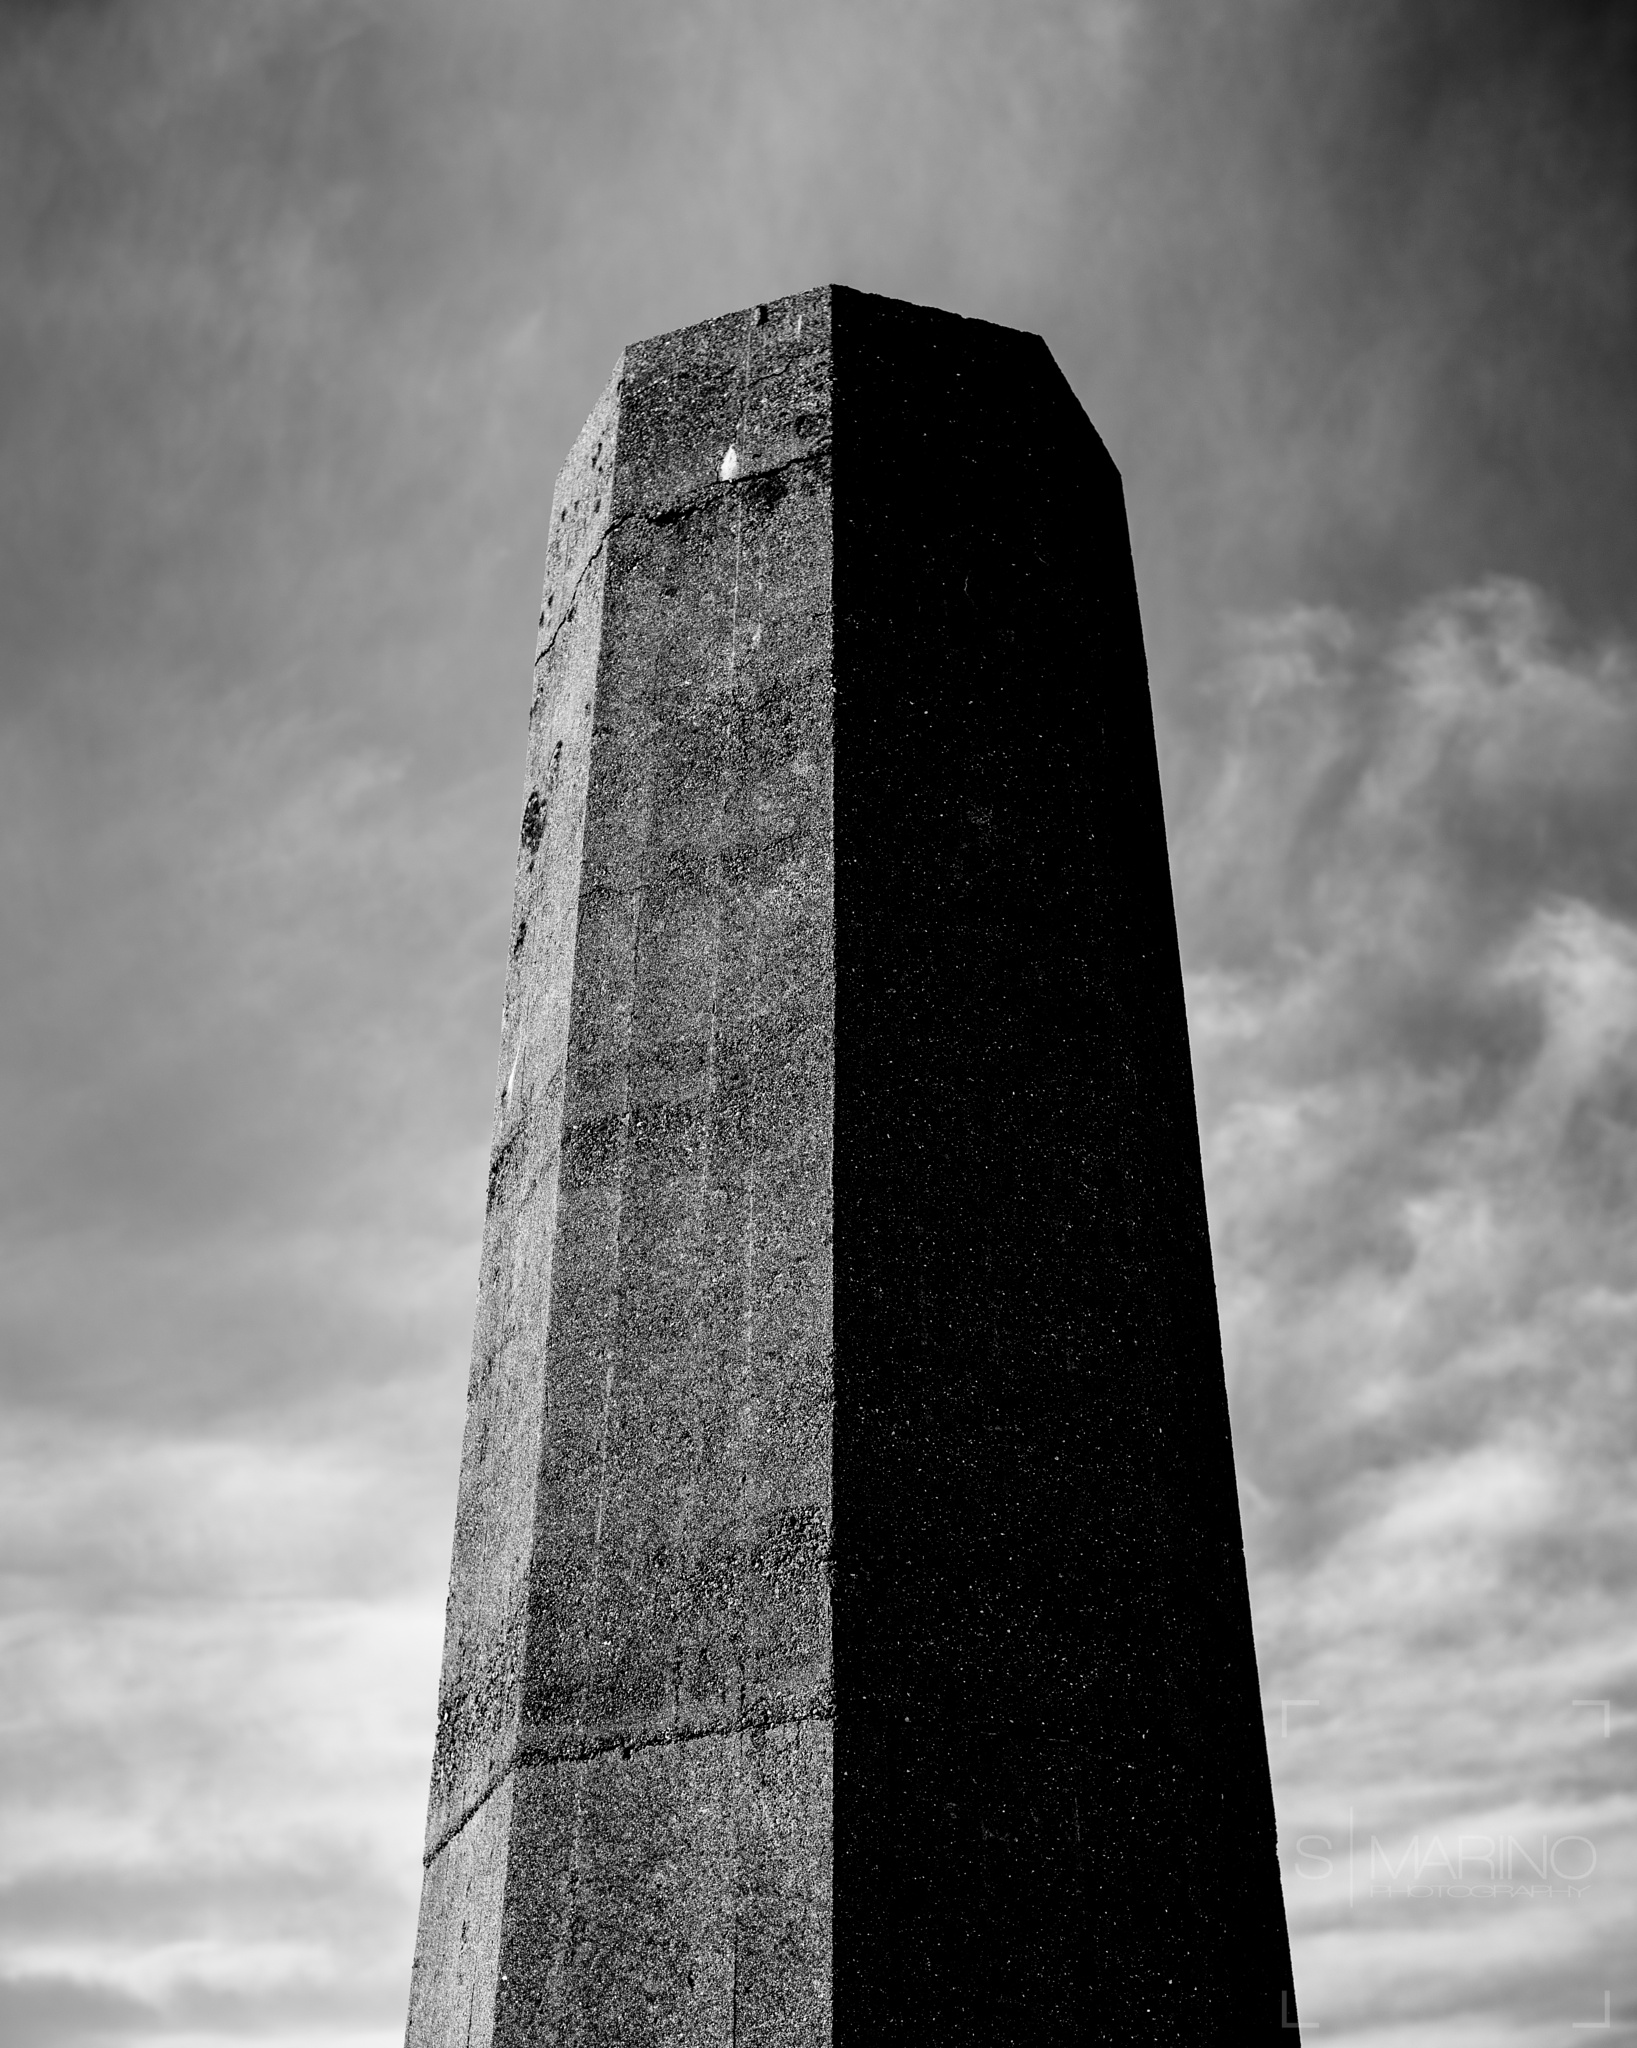 Monolith by LightWizard